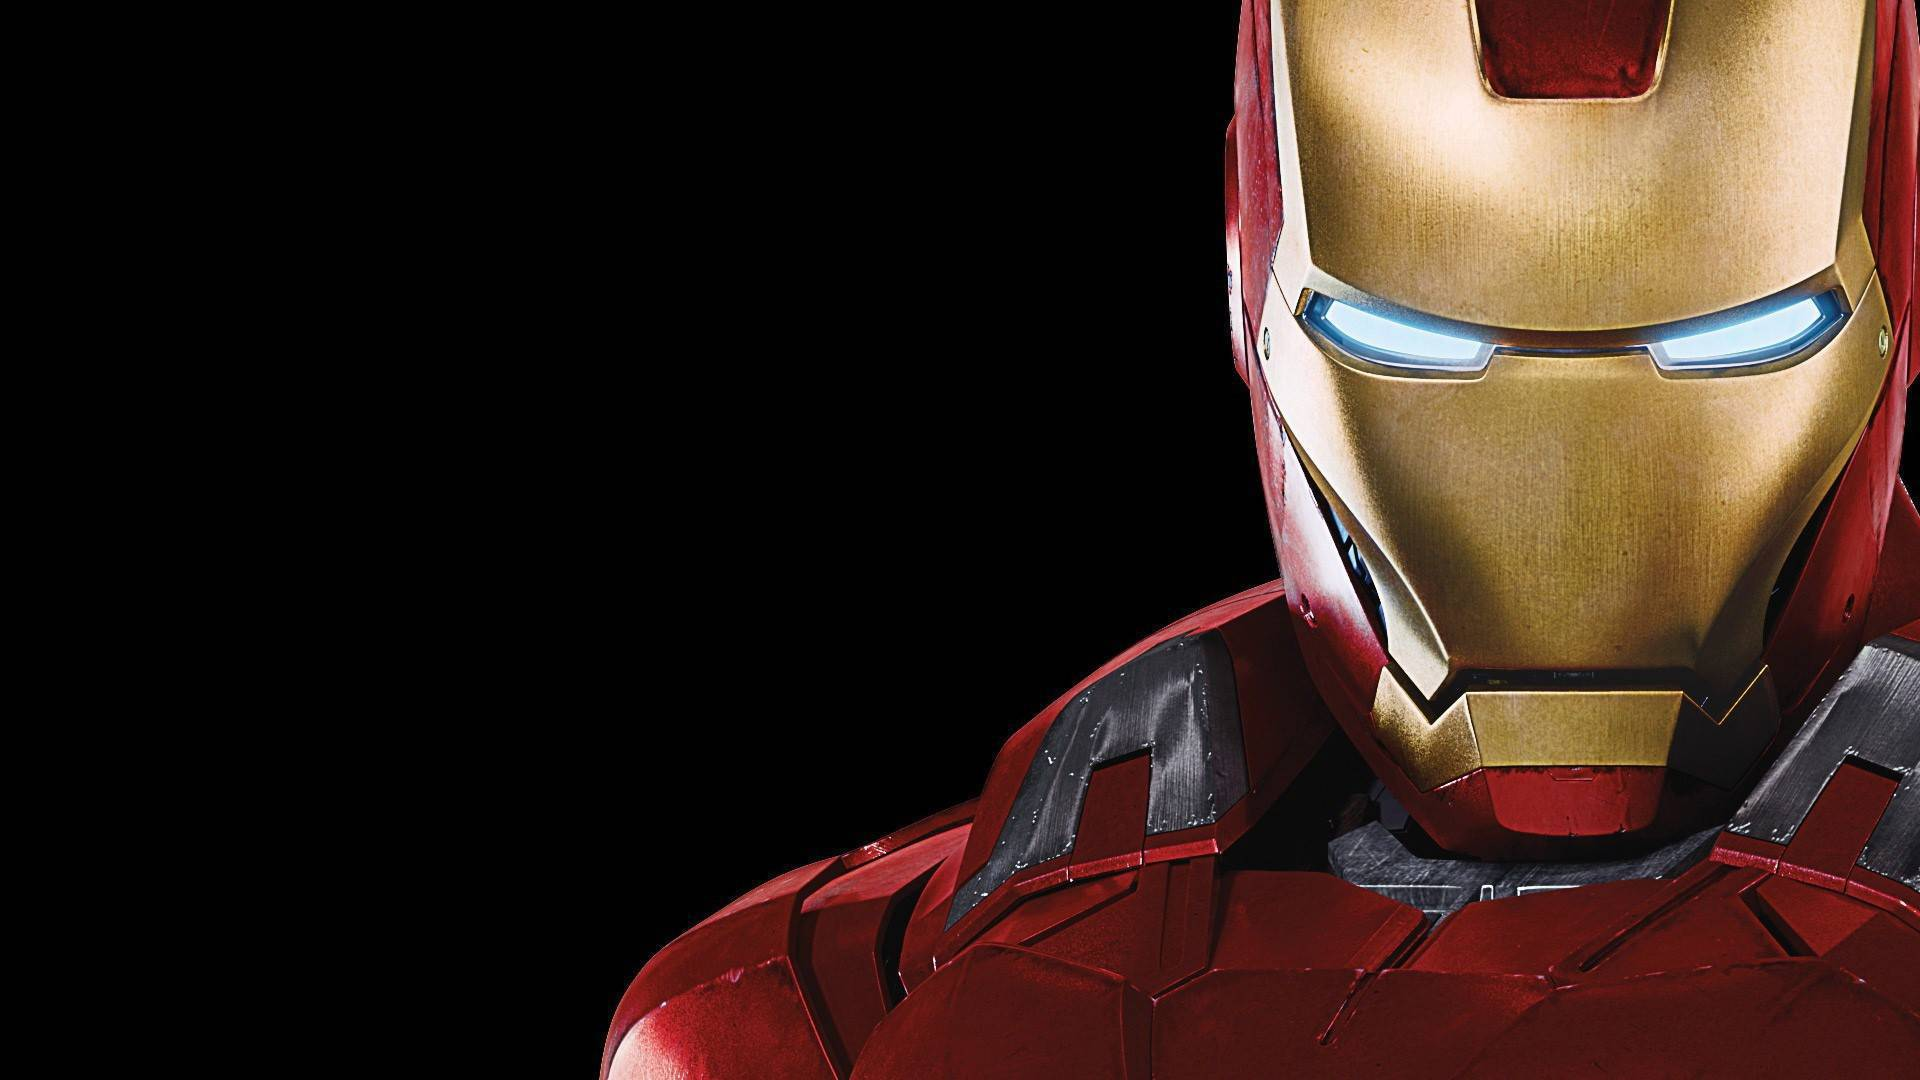 Fondos de Pantalla Wallpapers Gratis Iron Man   Wallpaper HD 1080p 1920x1080